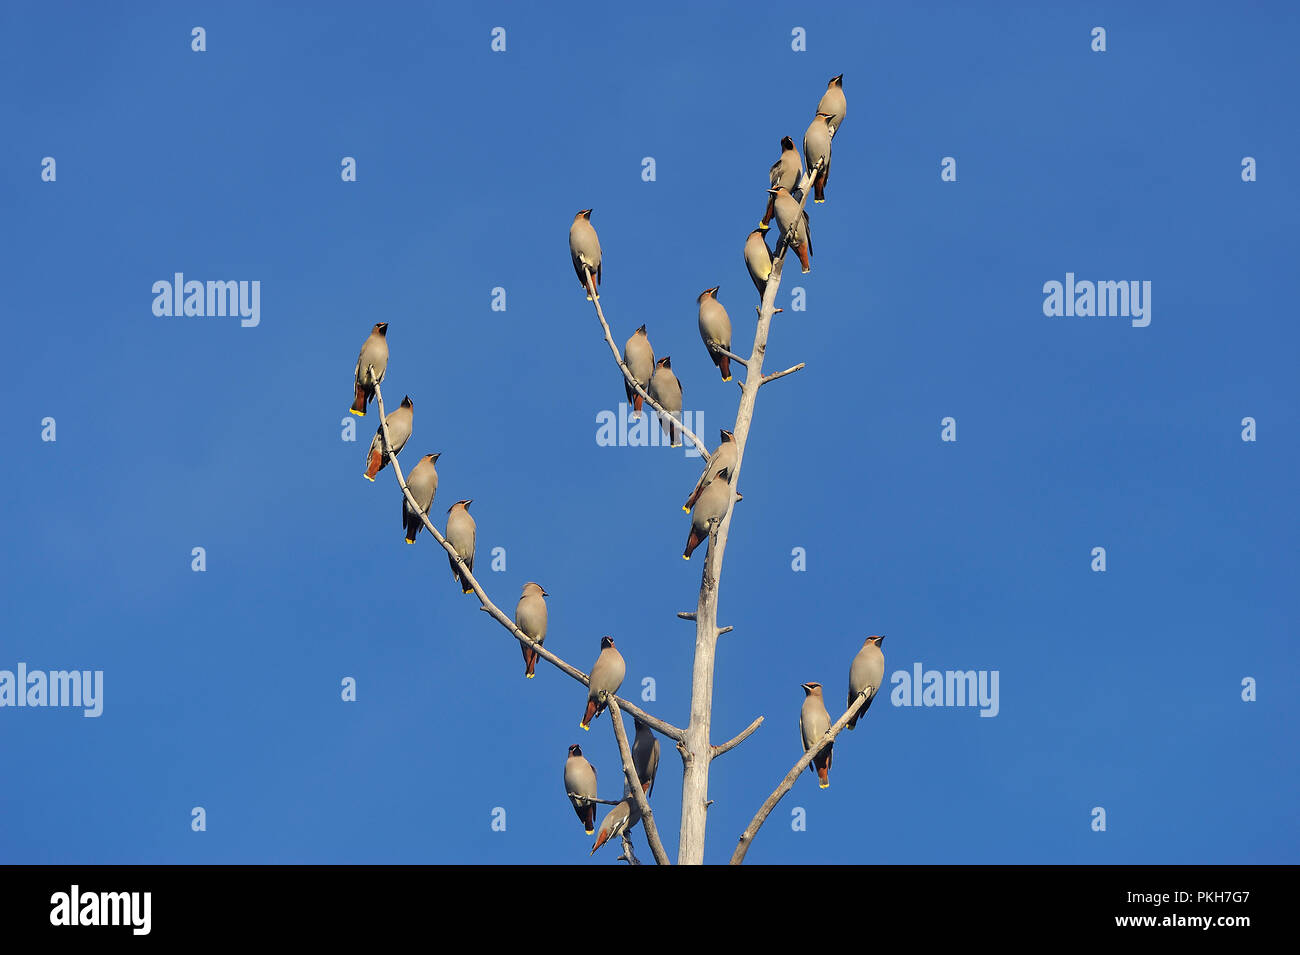 Un troupeau de Cedar waxwing oiseaux posés en-un arbre mort contre un fond de ciel bleu dans les régions rurales de l'Alberta au Canada. Photo Stock